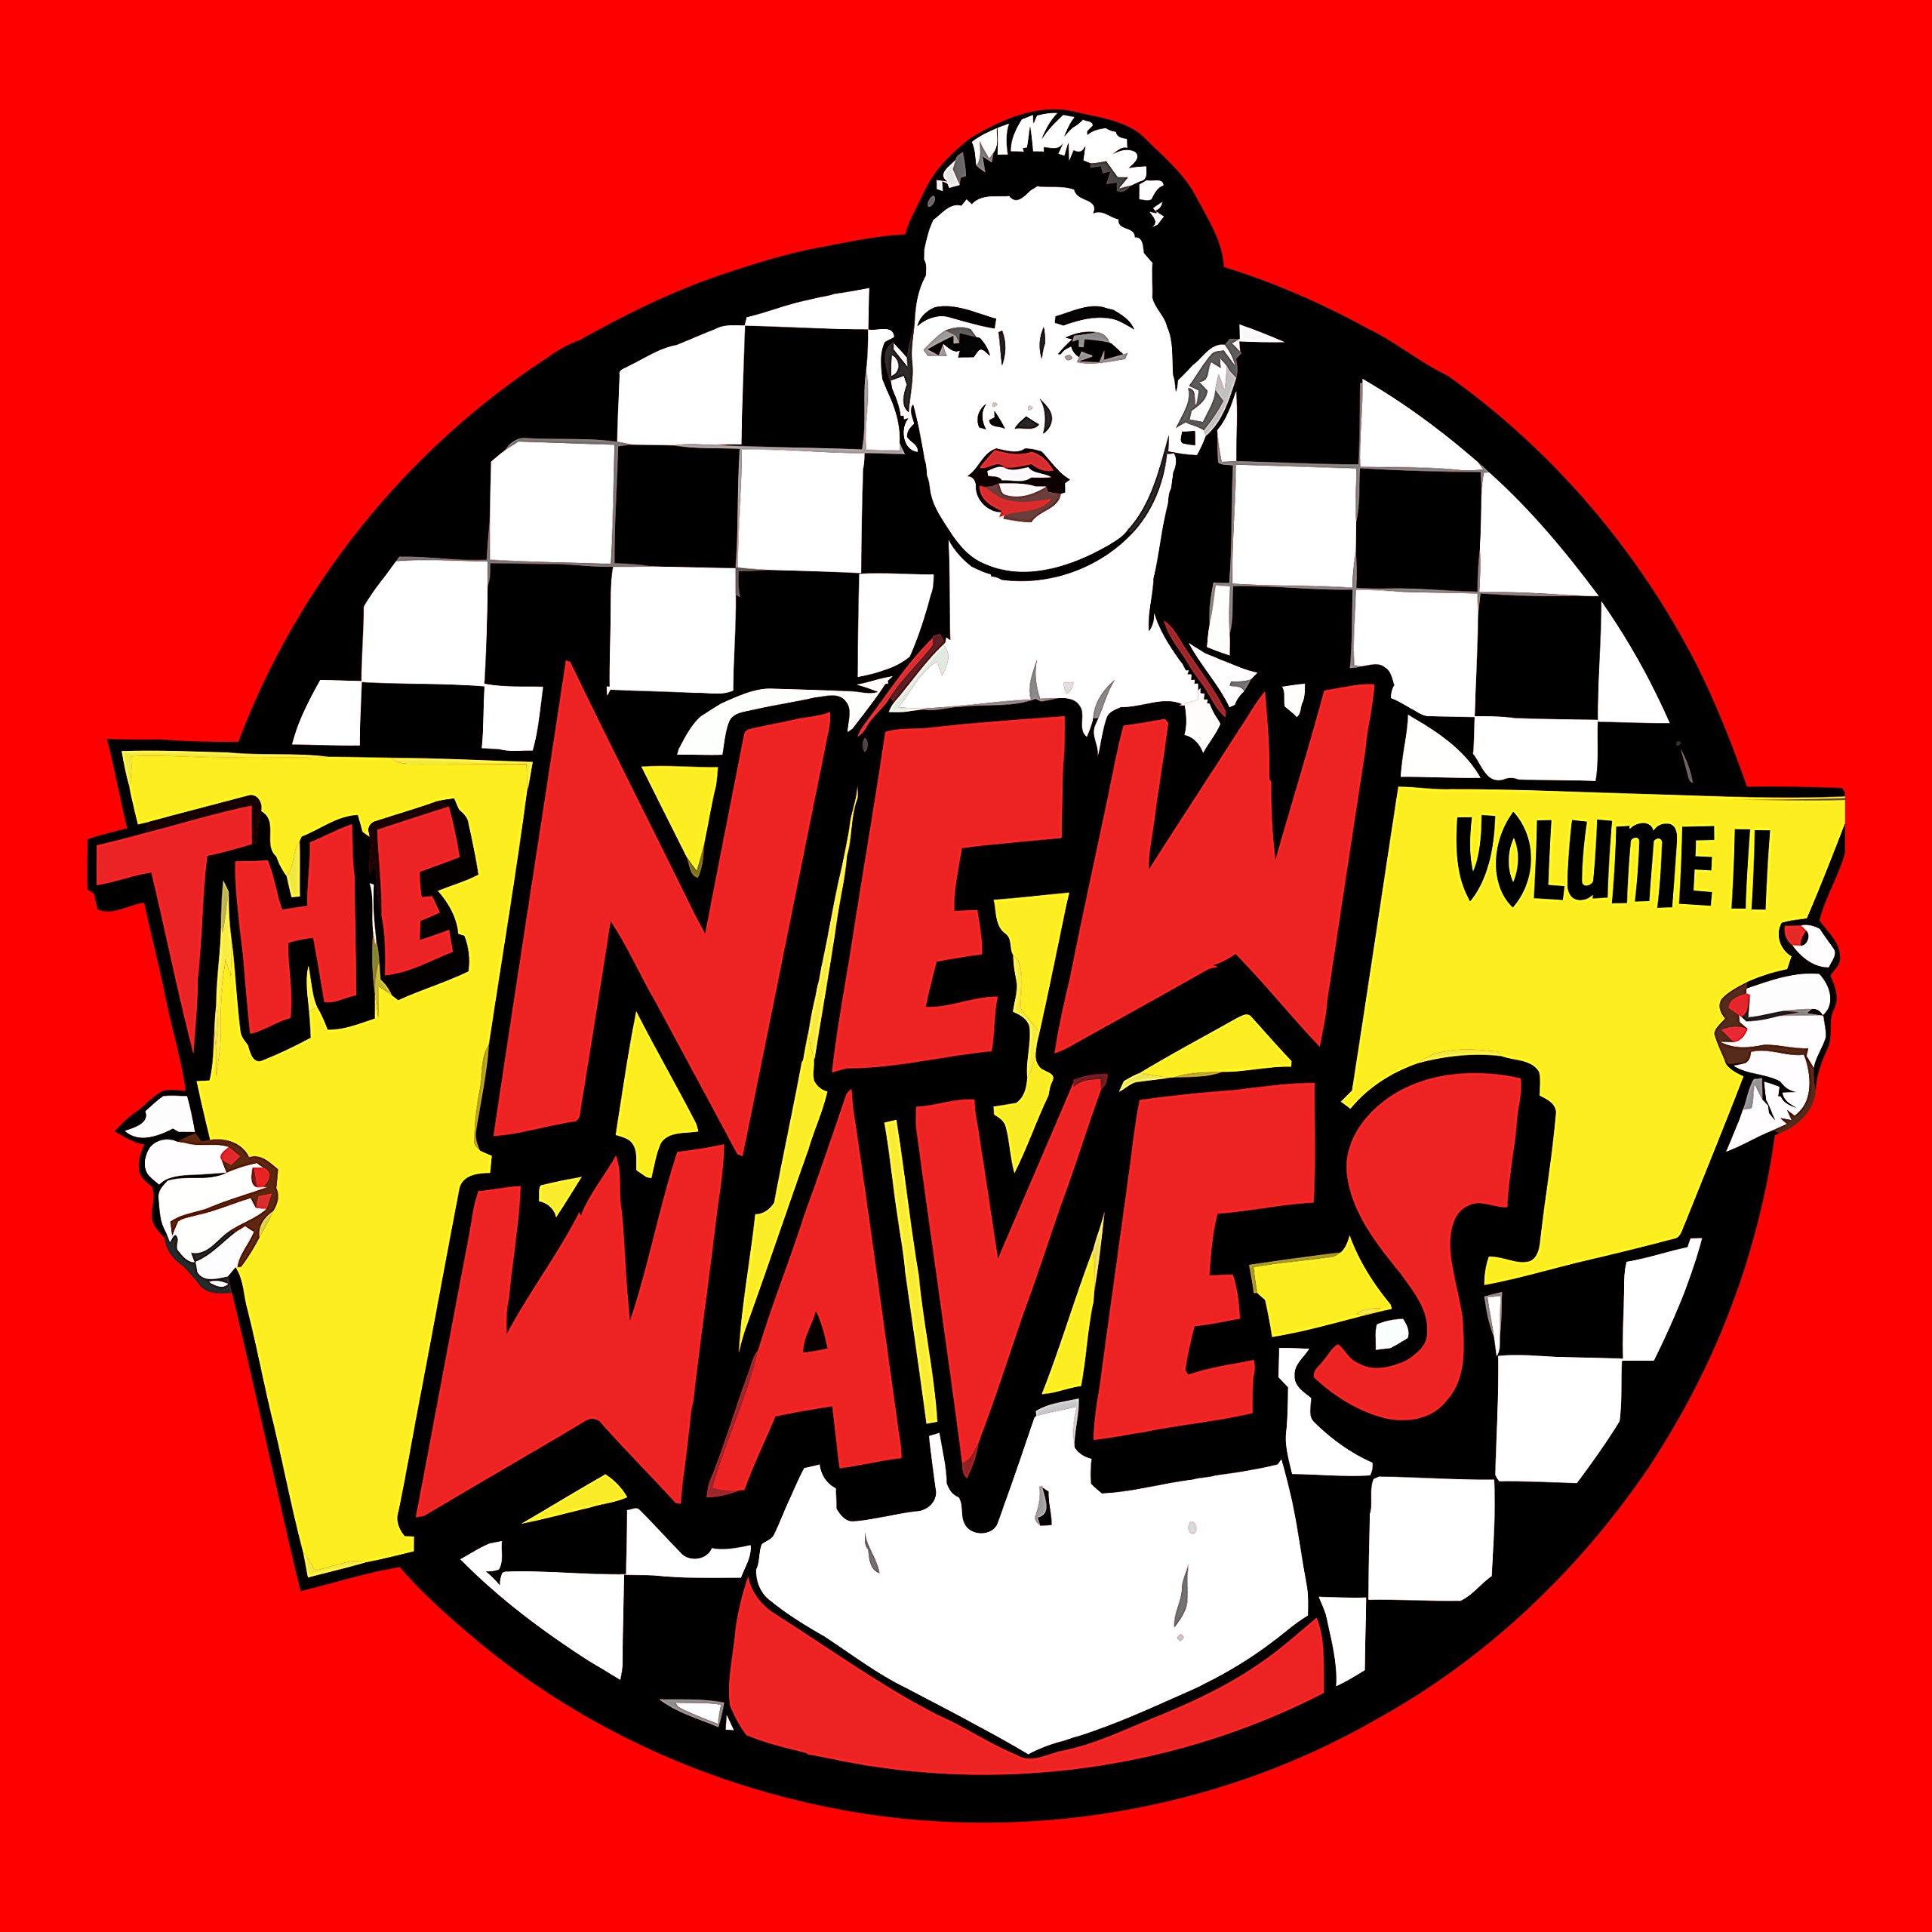 CD : New Waves - Volume Ii (CD)